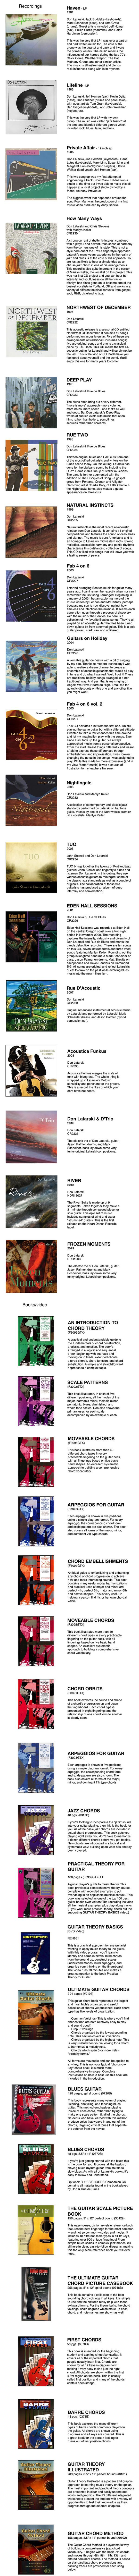 don Latarski discography book list.jpg